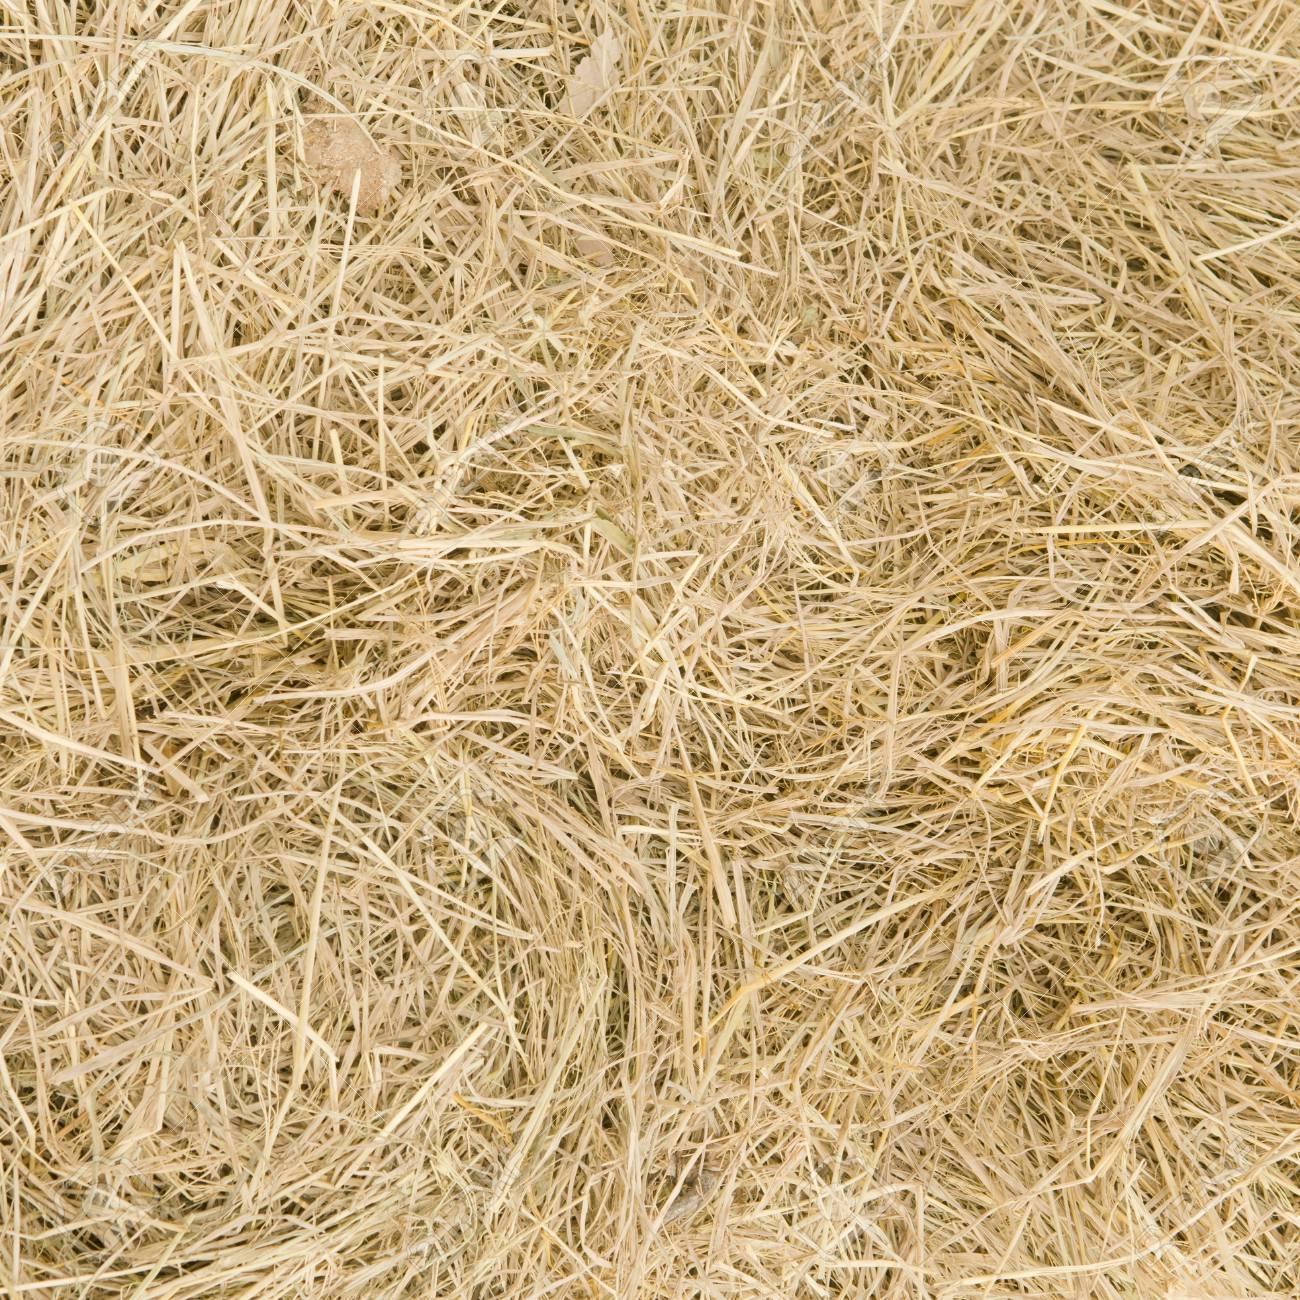 Straw texture background Stock Photo - 19132211